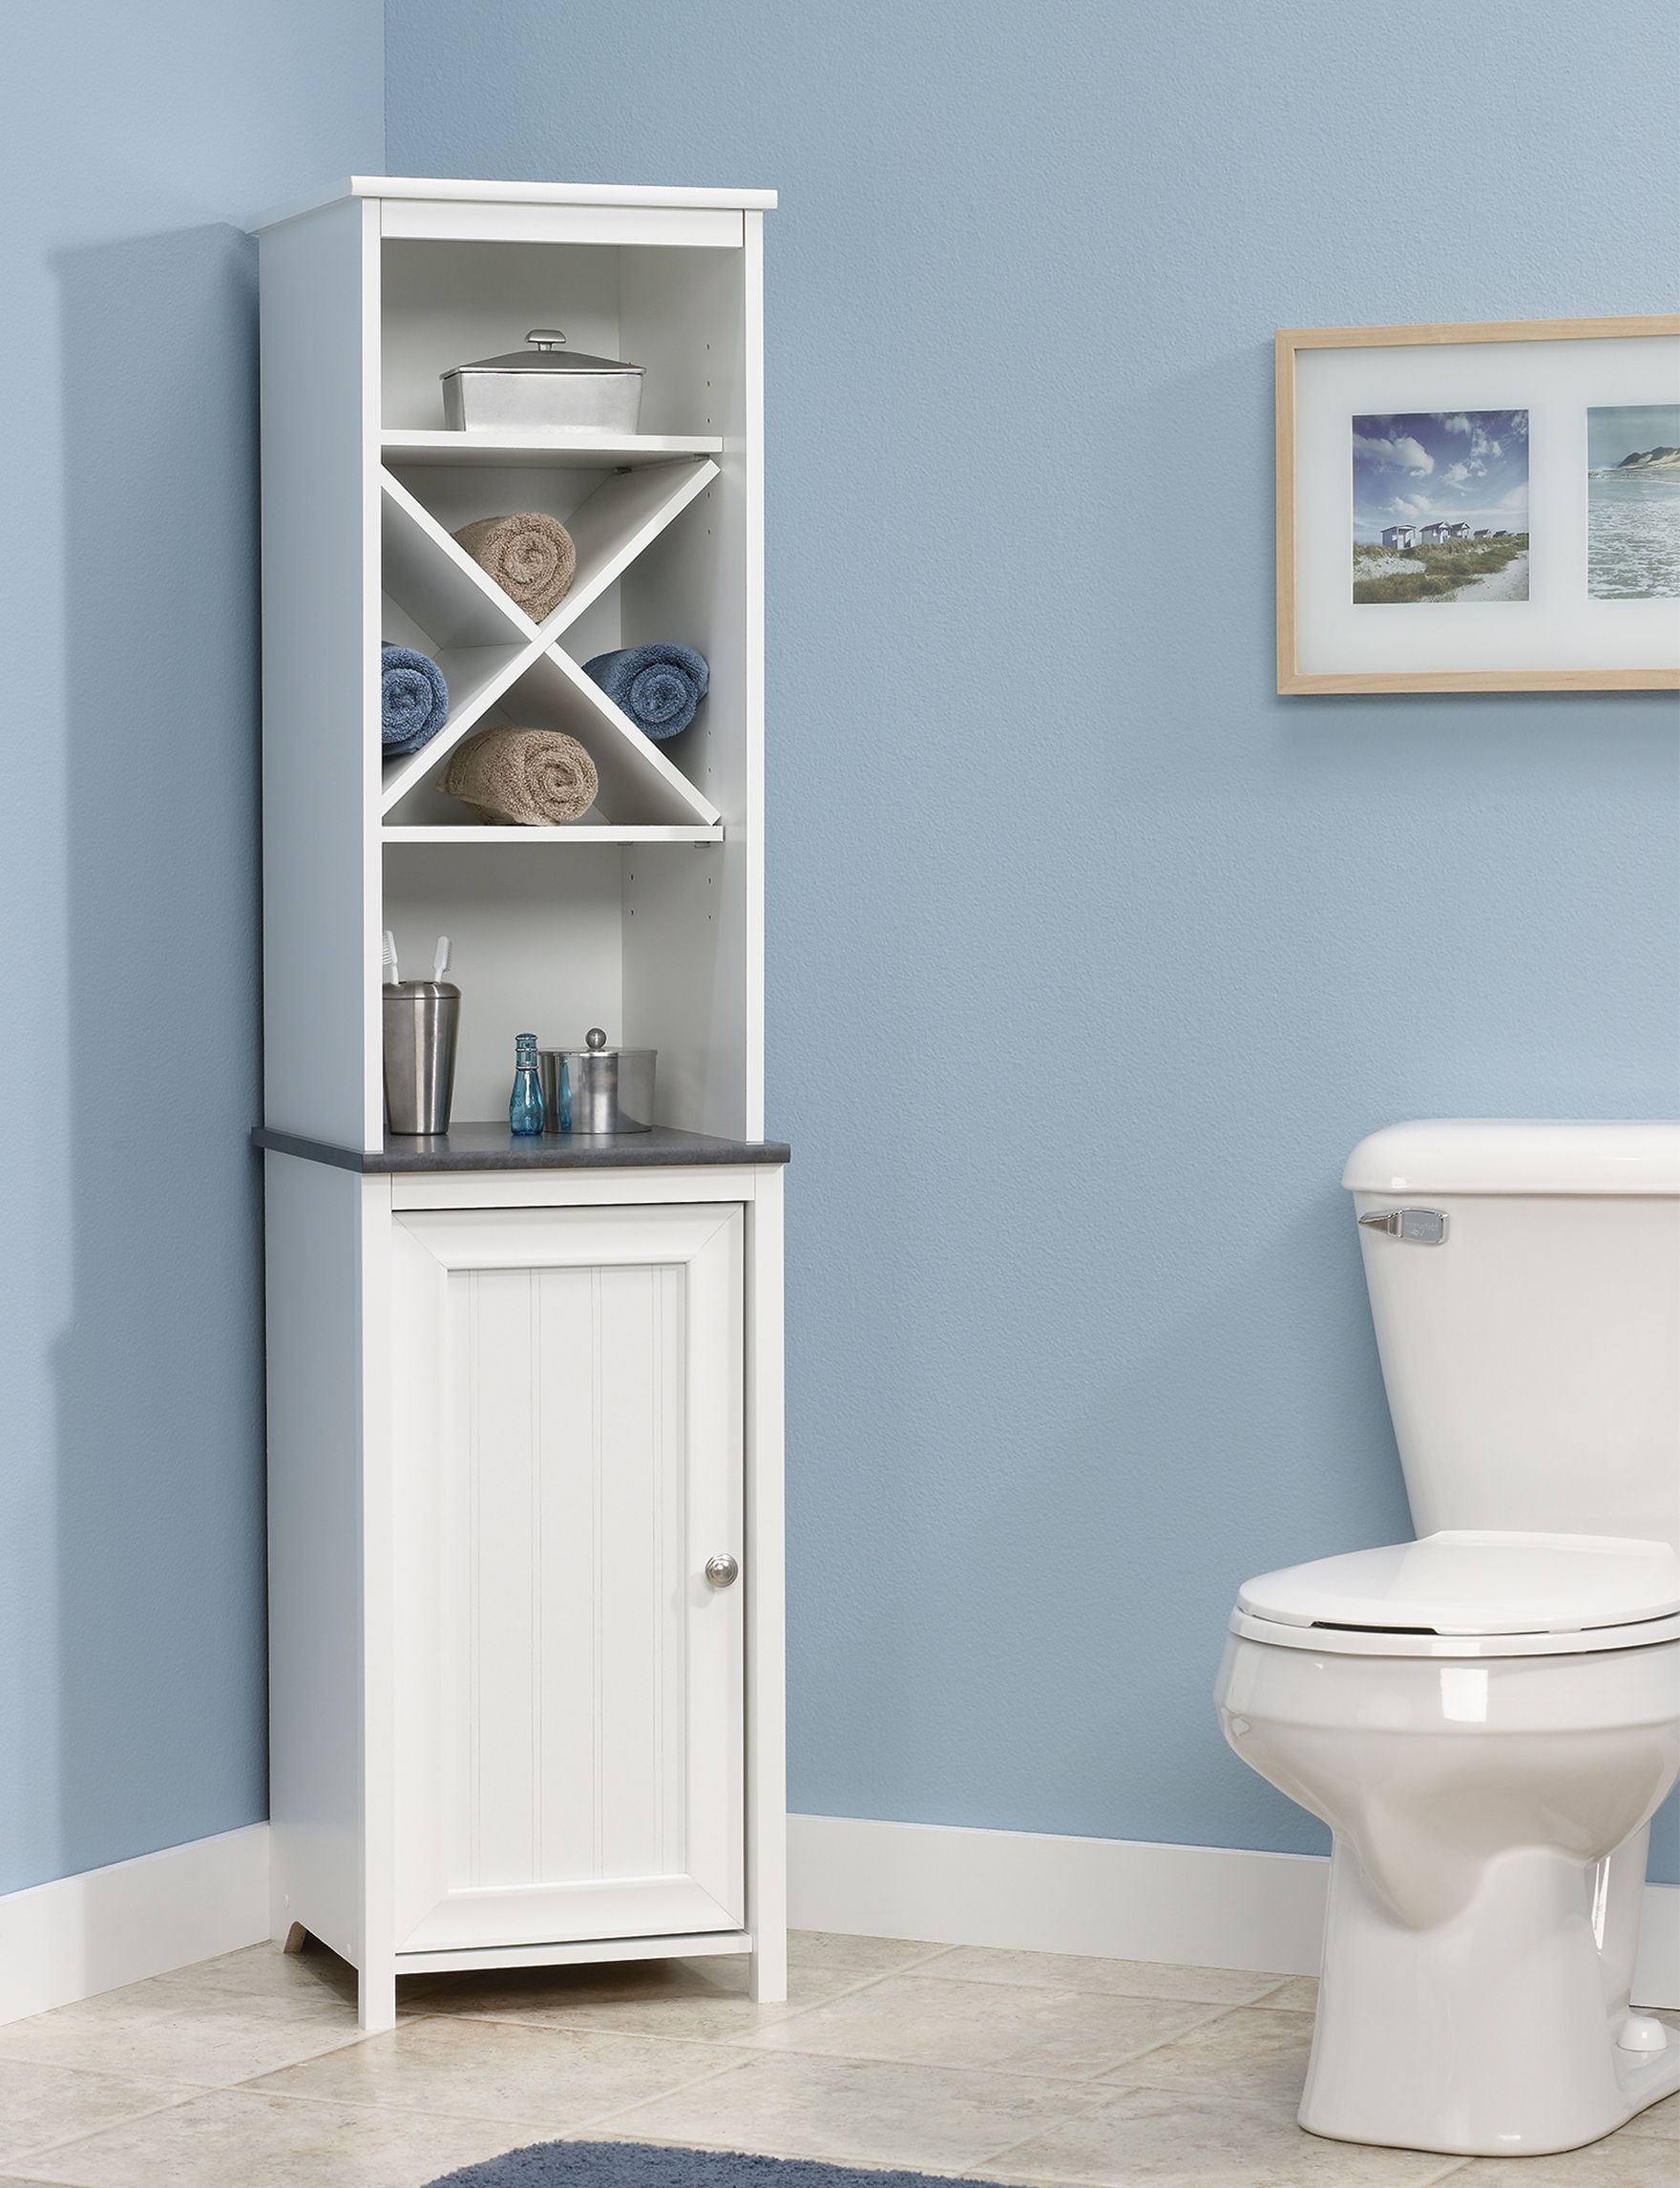 Sauder Off White Storage Shelves Bathroom Furniture